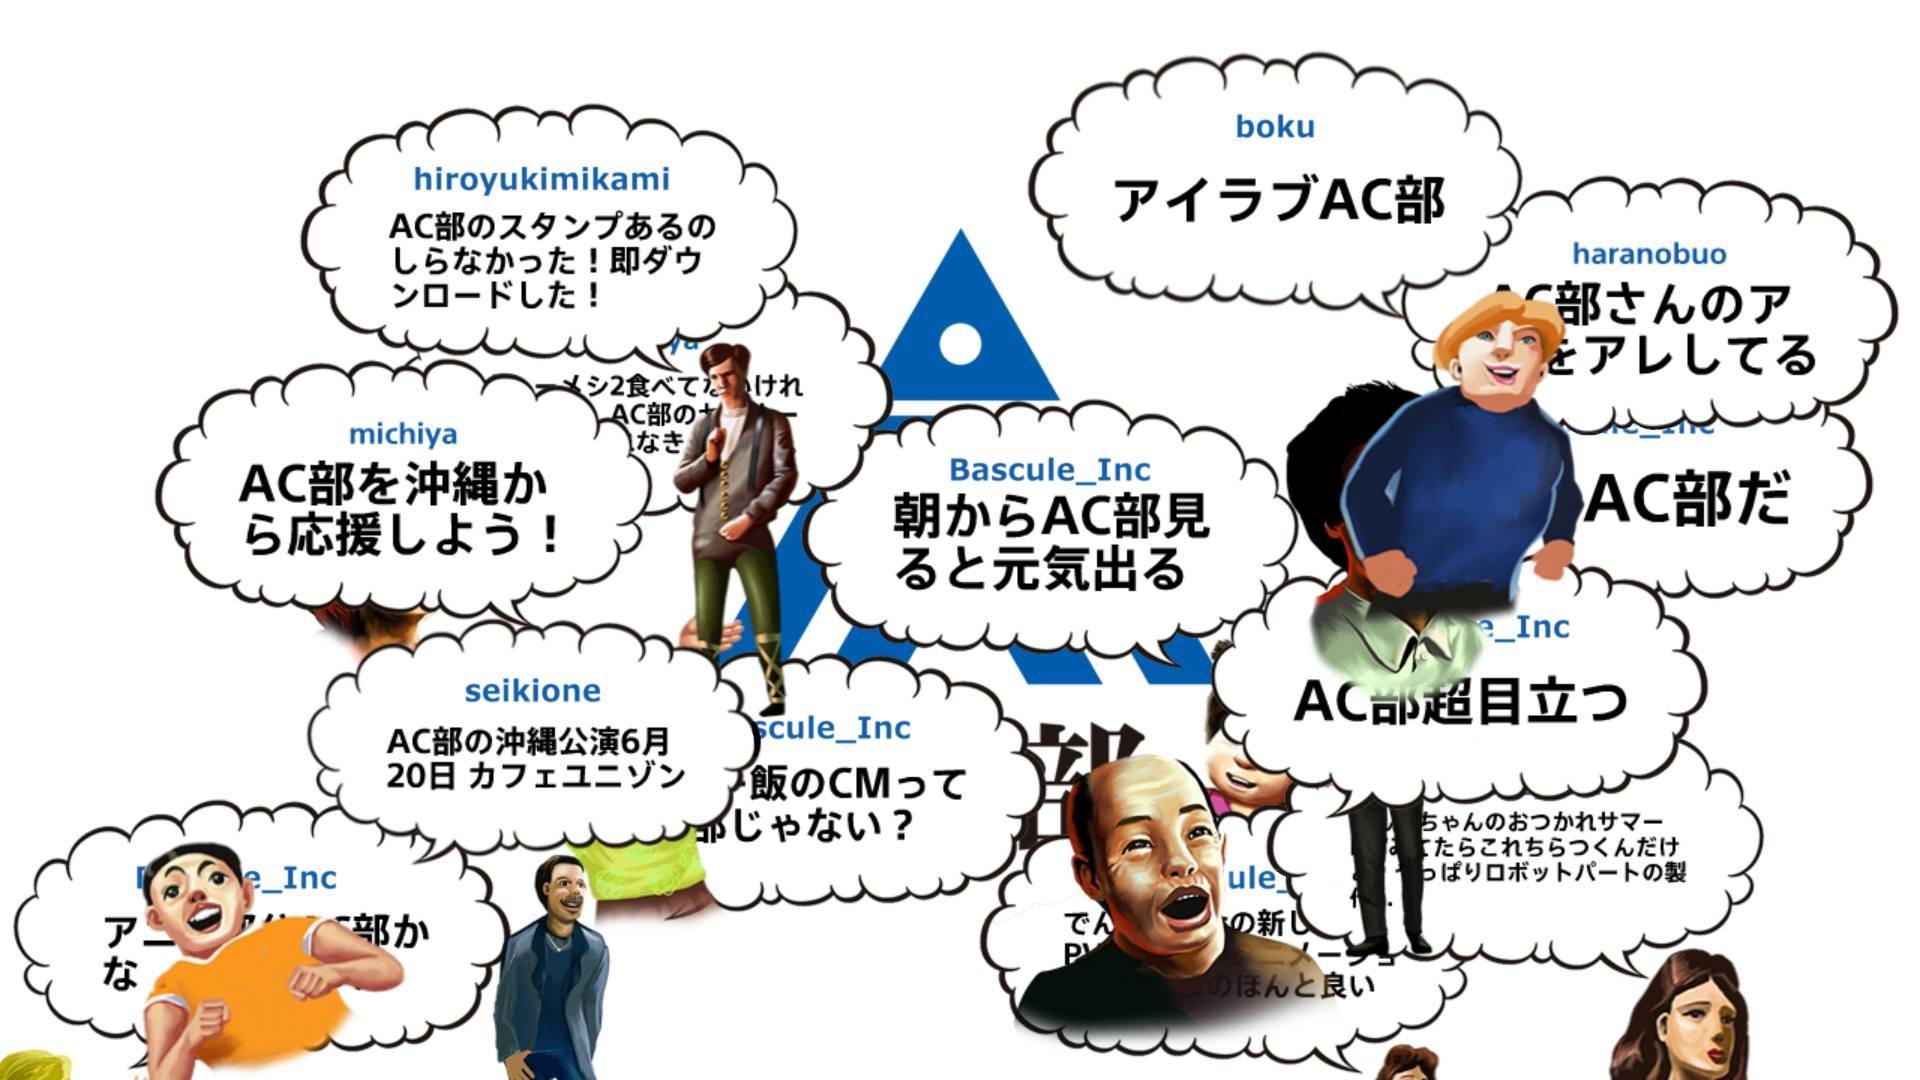 CN17「頑張れAC部 in OKINAWA」セミナーに「頑張れ!」って応援しよう